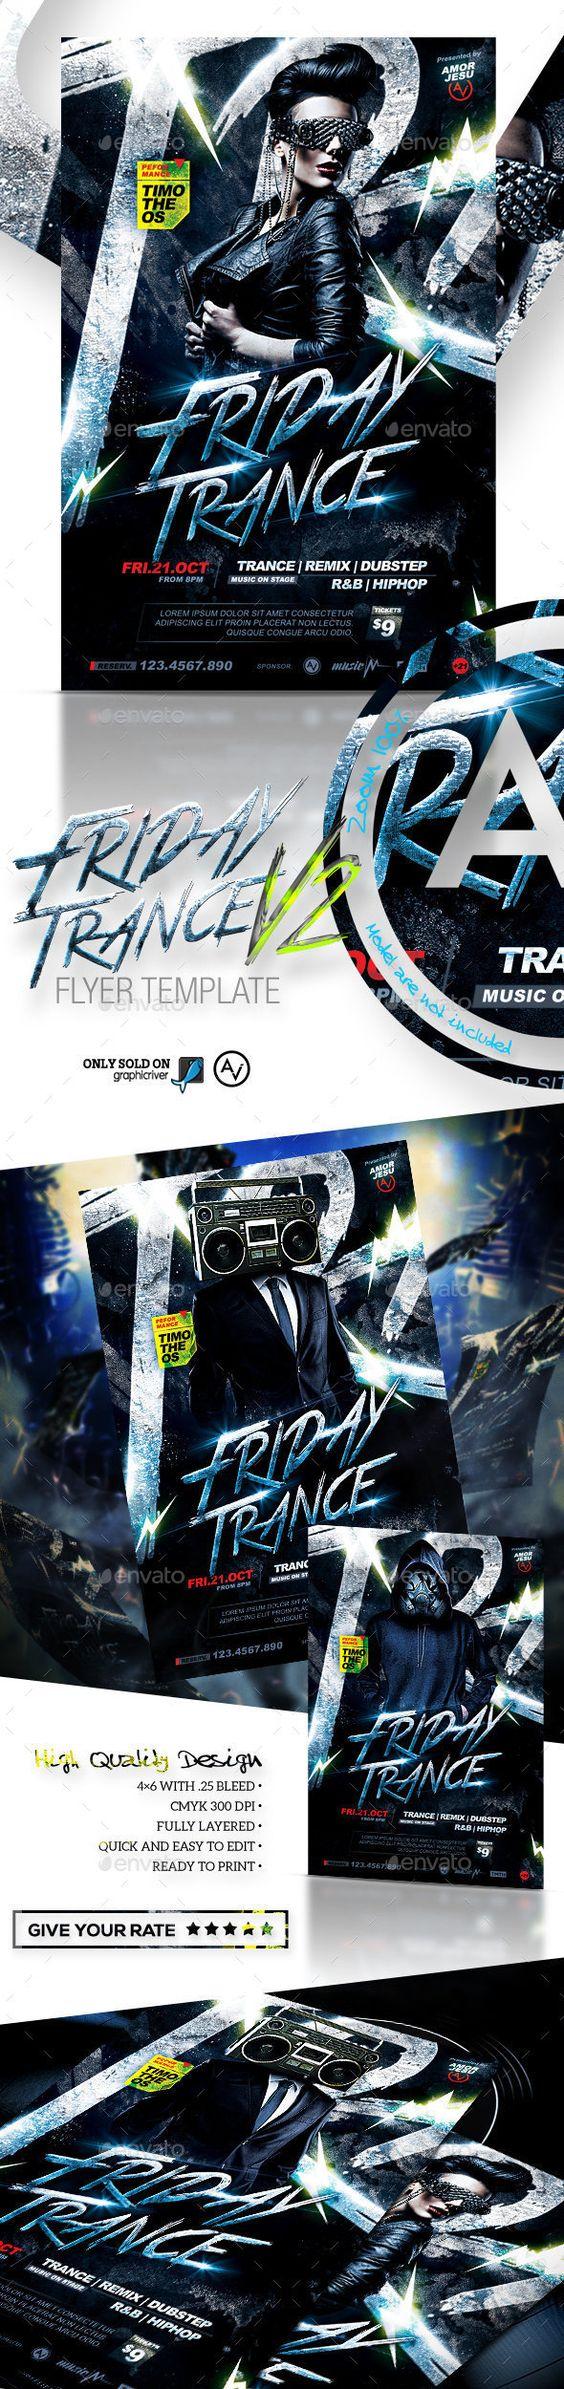 Friday Trance Flyer Template V2